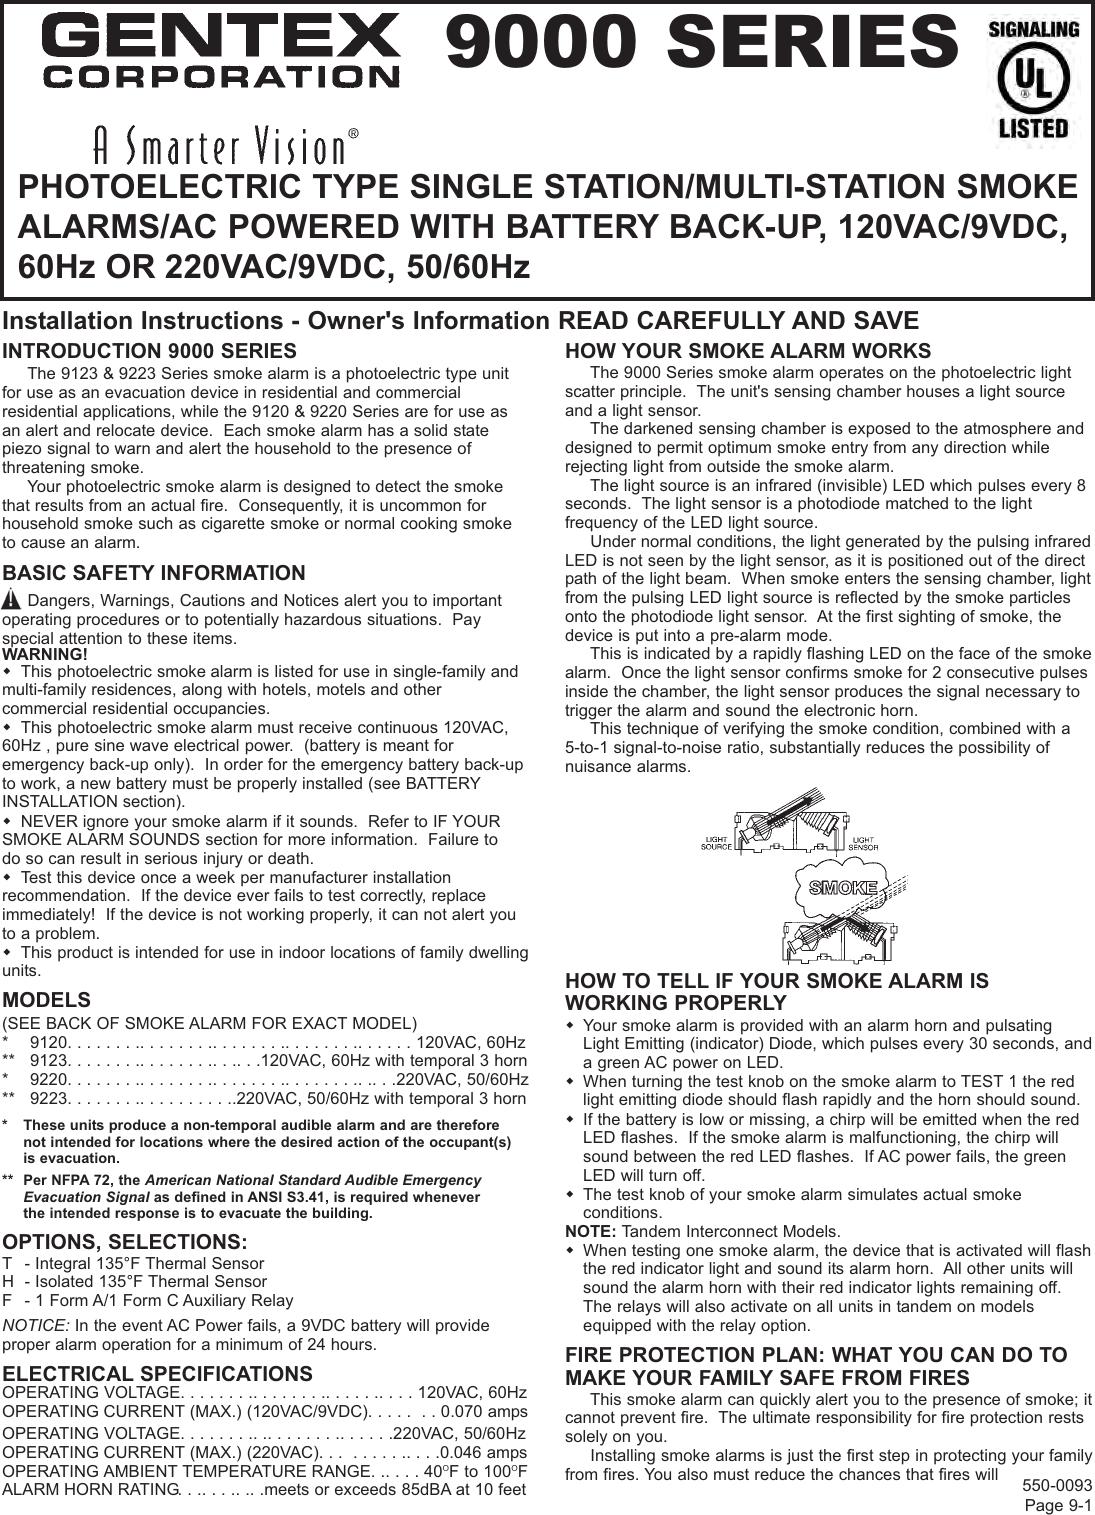 Gentex 9120 HF Photoelectric Smoke Alarm